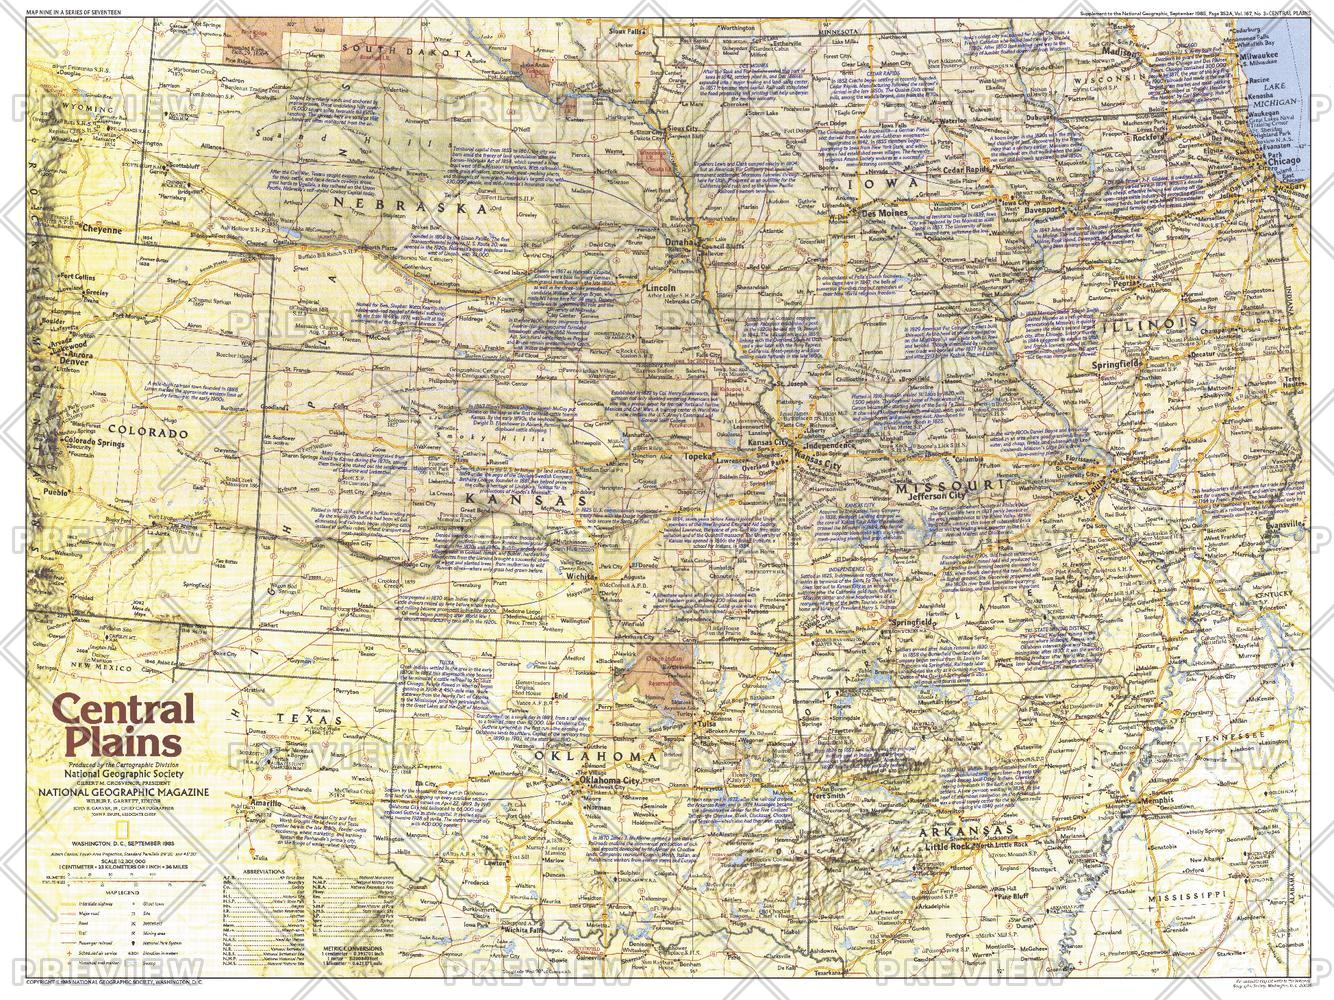 Central Plains Map Side 1 - Published 1985